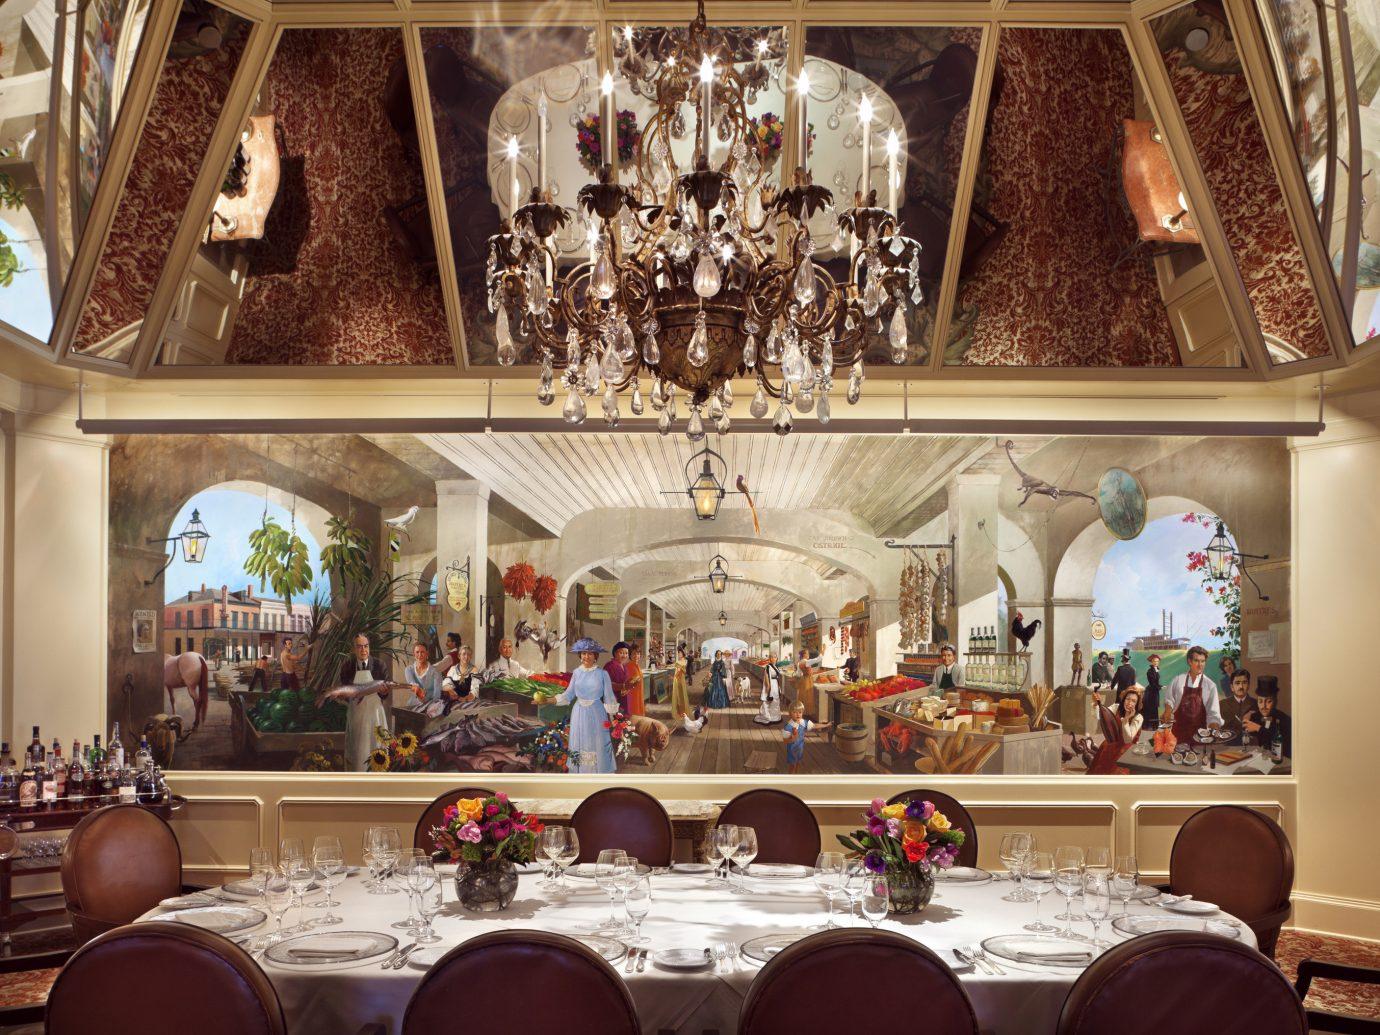 Food + Drink indoor room interior design function hall estate ballroom meal altar mansion palace dining room